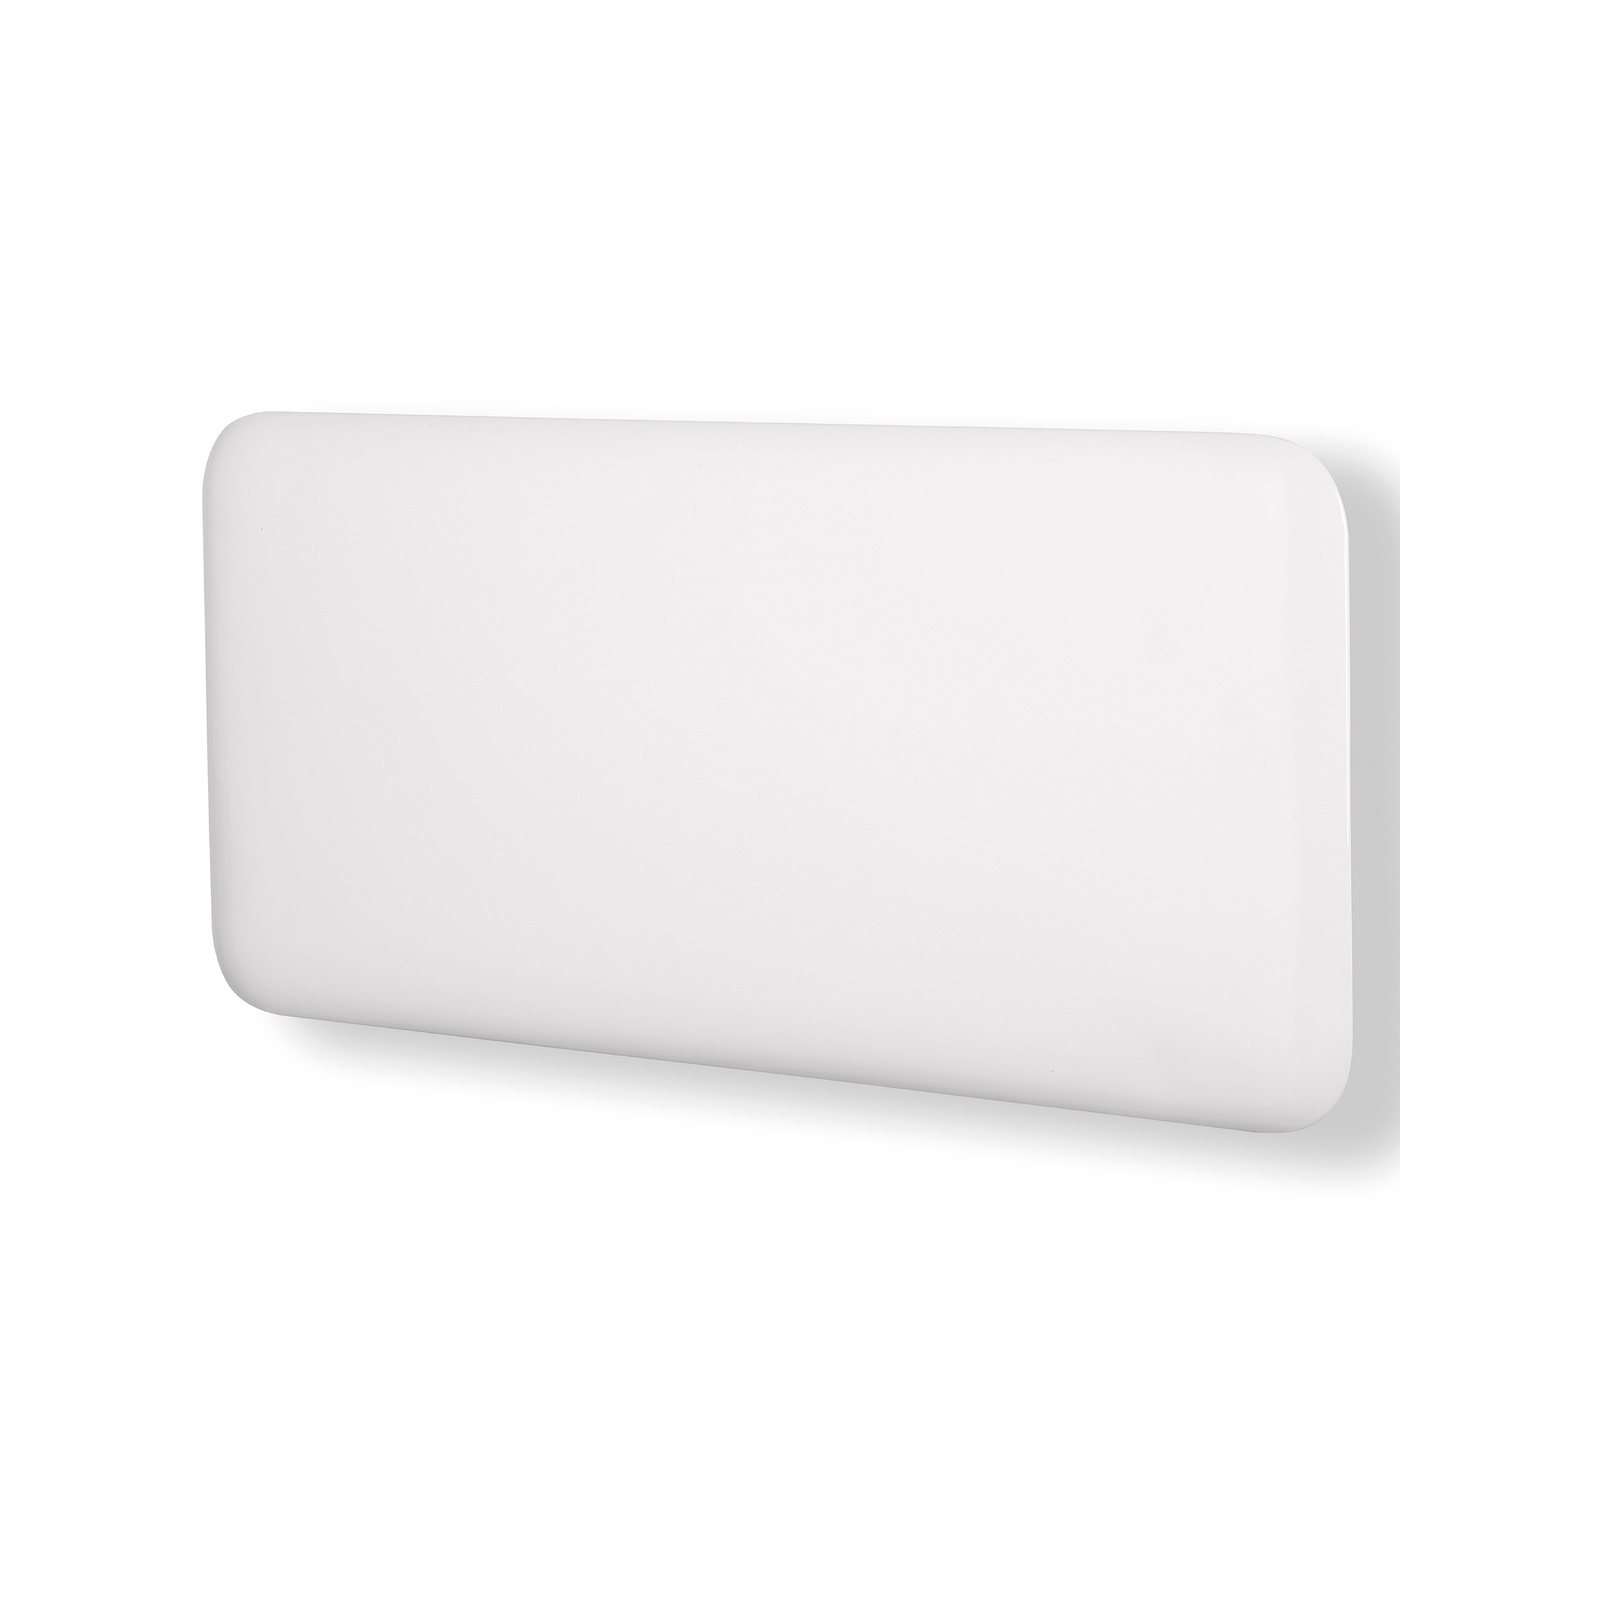 Mill 2000W White Panel Heater